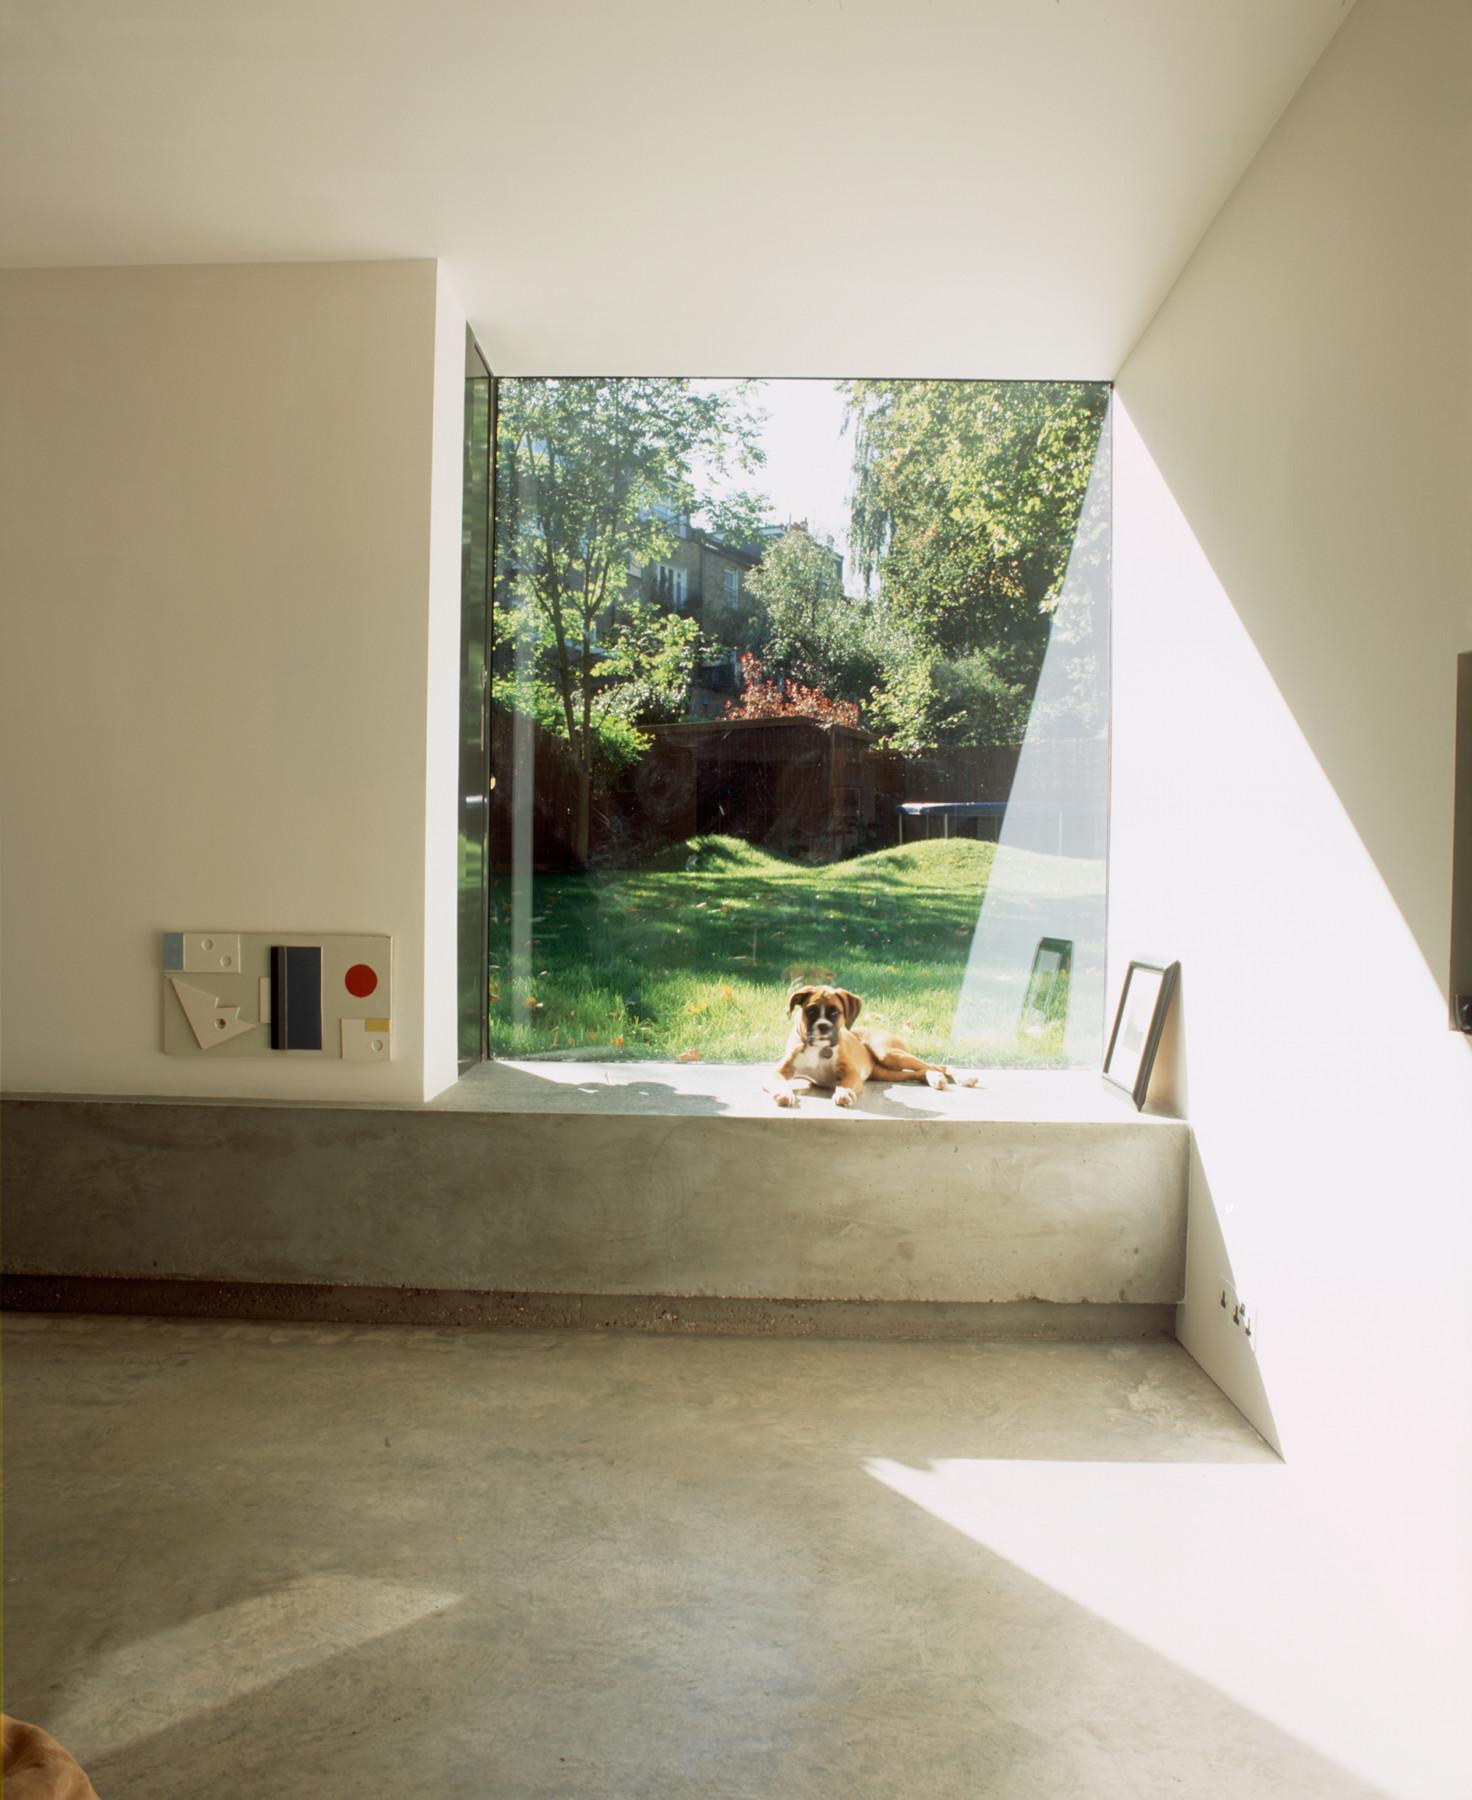 Kander-house-Primrose-hill-London-residential-home-contemporary-interior-Riba-award-victorian-Jamie-Fobert-Architects-window